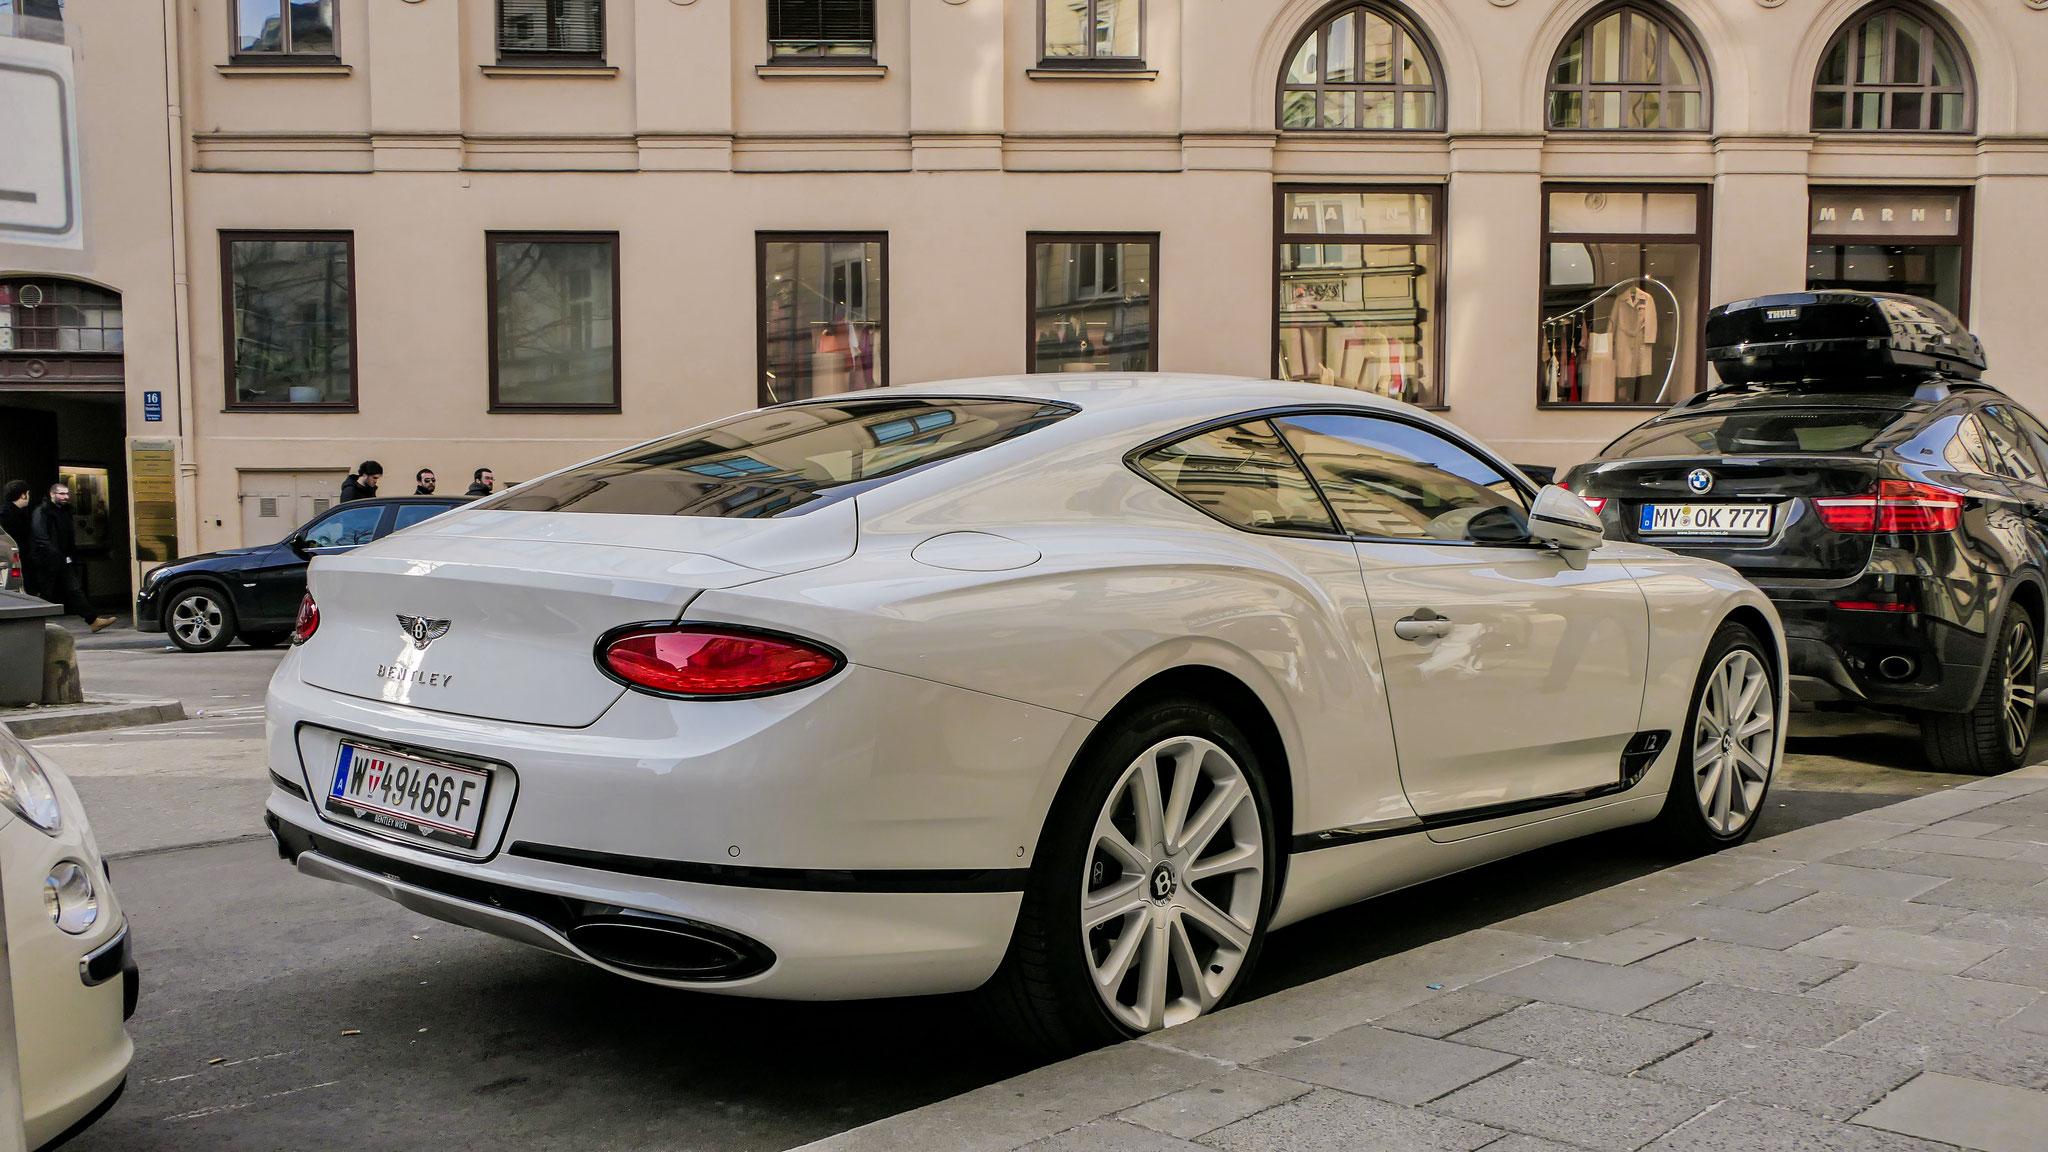 Bentley Continental GT - W-49466-F (AUT)